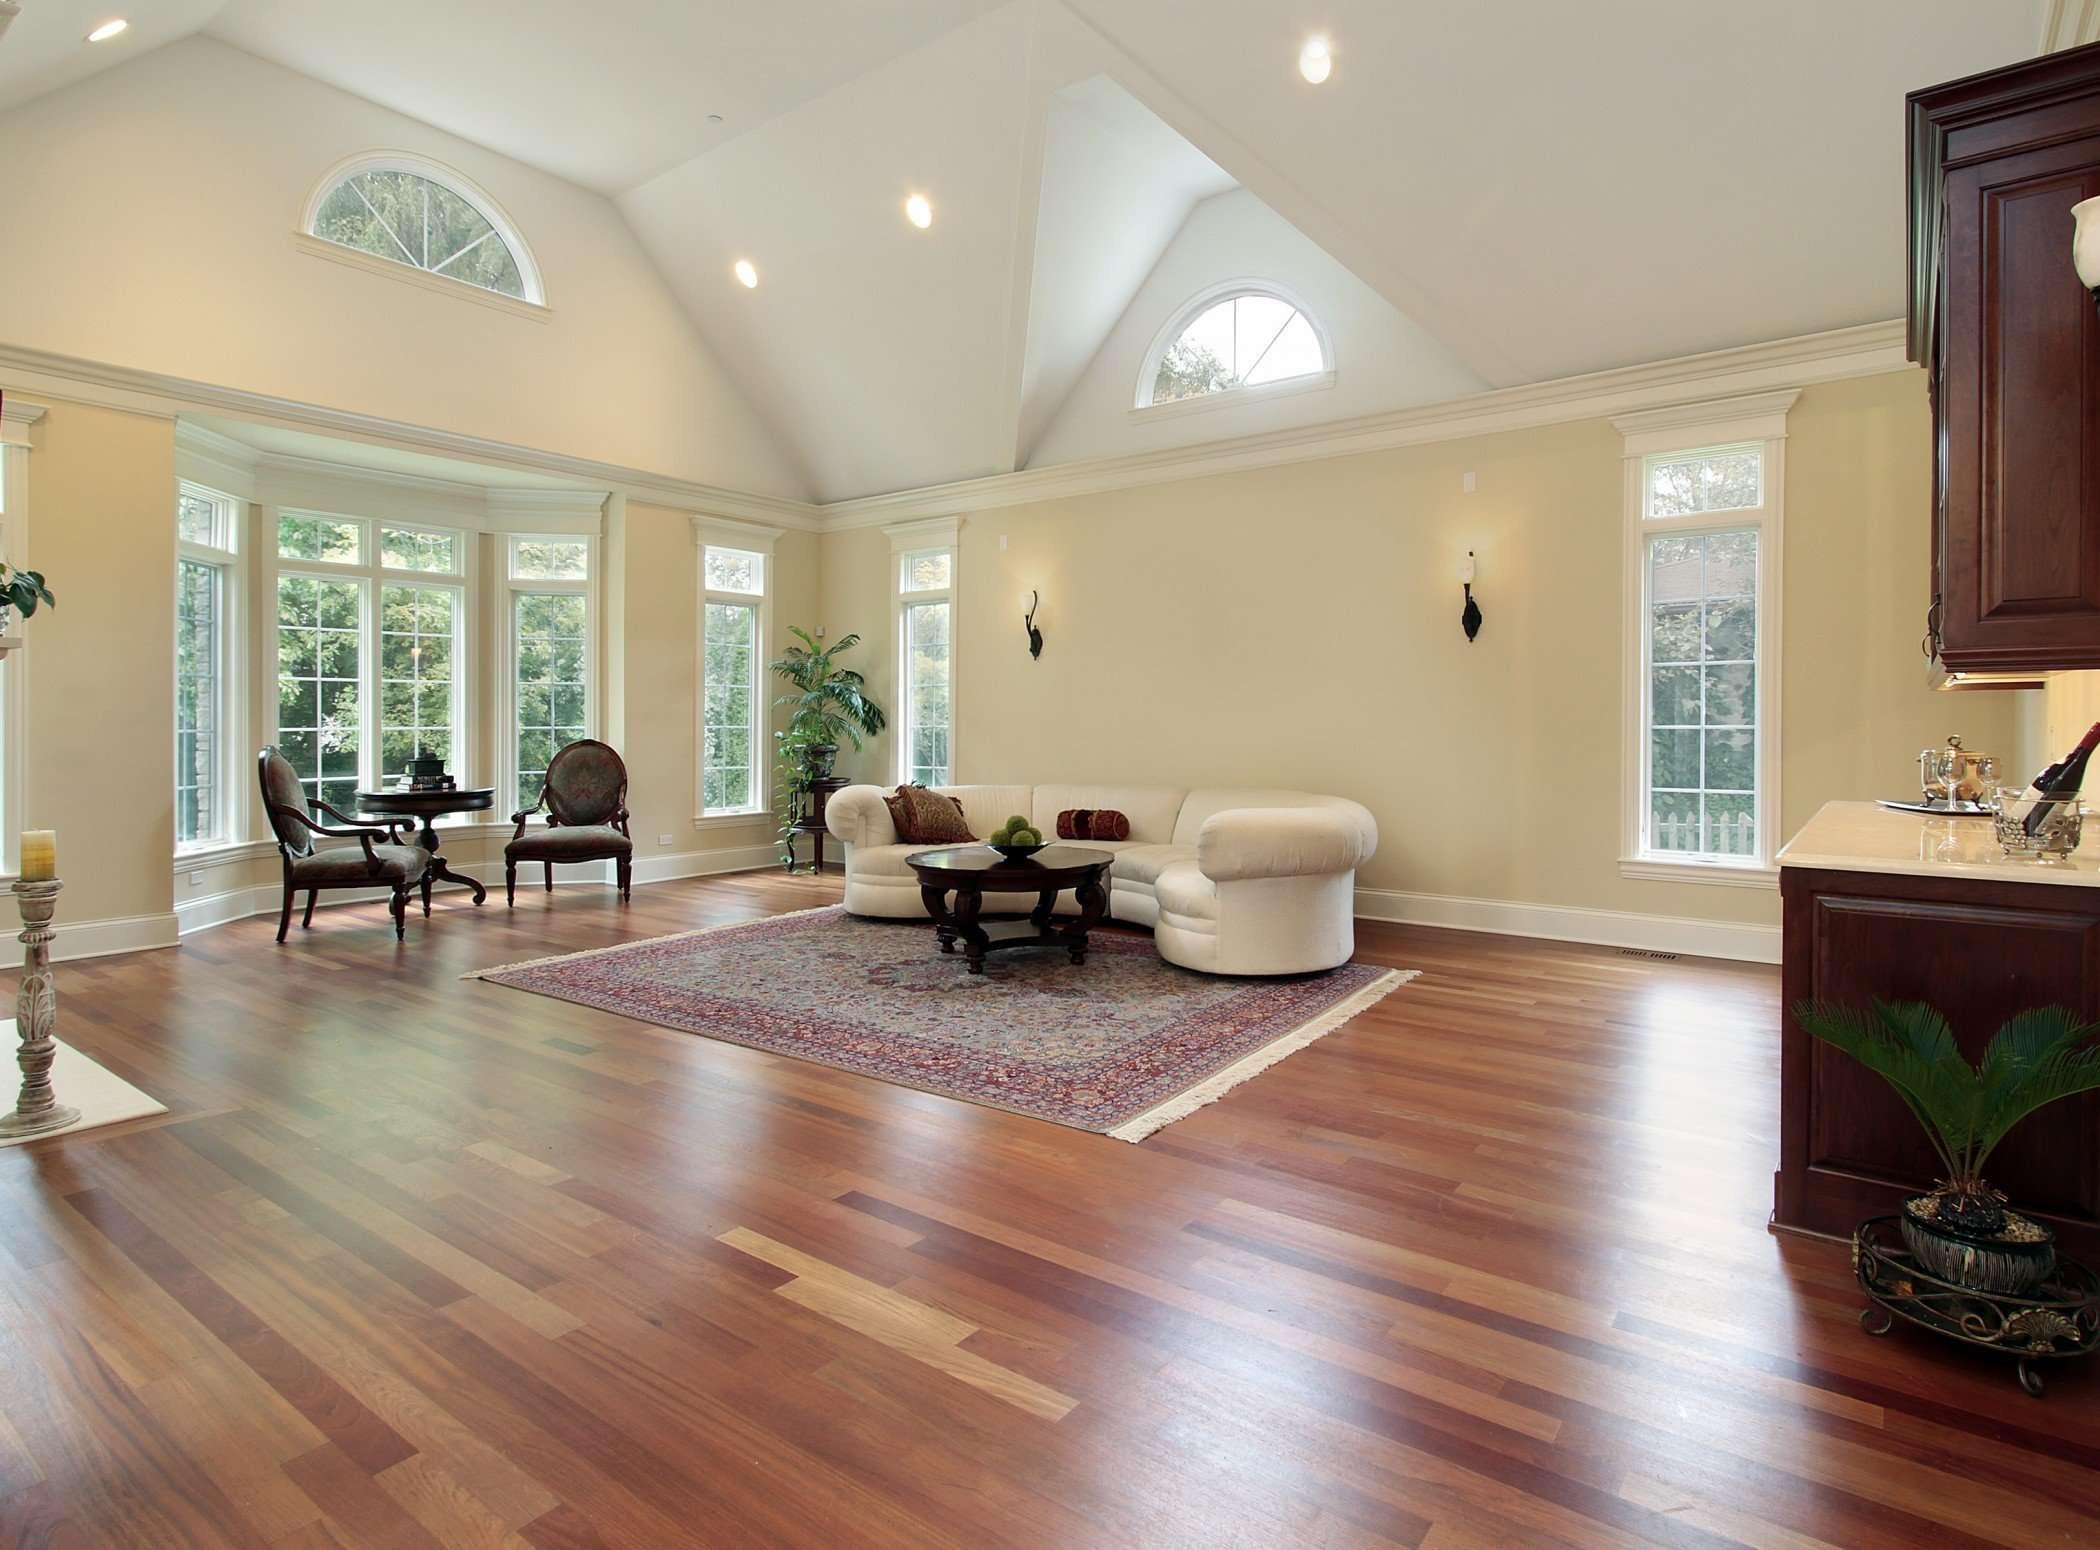 19 Amazing Hardwood Floor Price Estimator 2021 free download hardwood floor price estimator of wood floor price lists a1 wood floors intended for perths largest range of wood floors